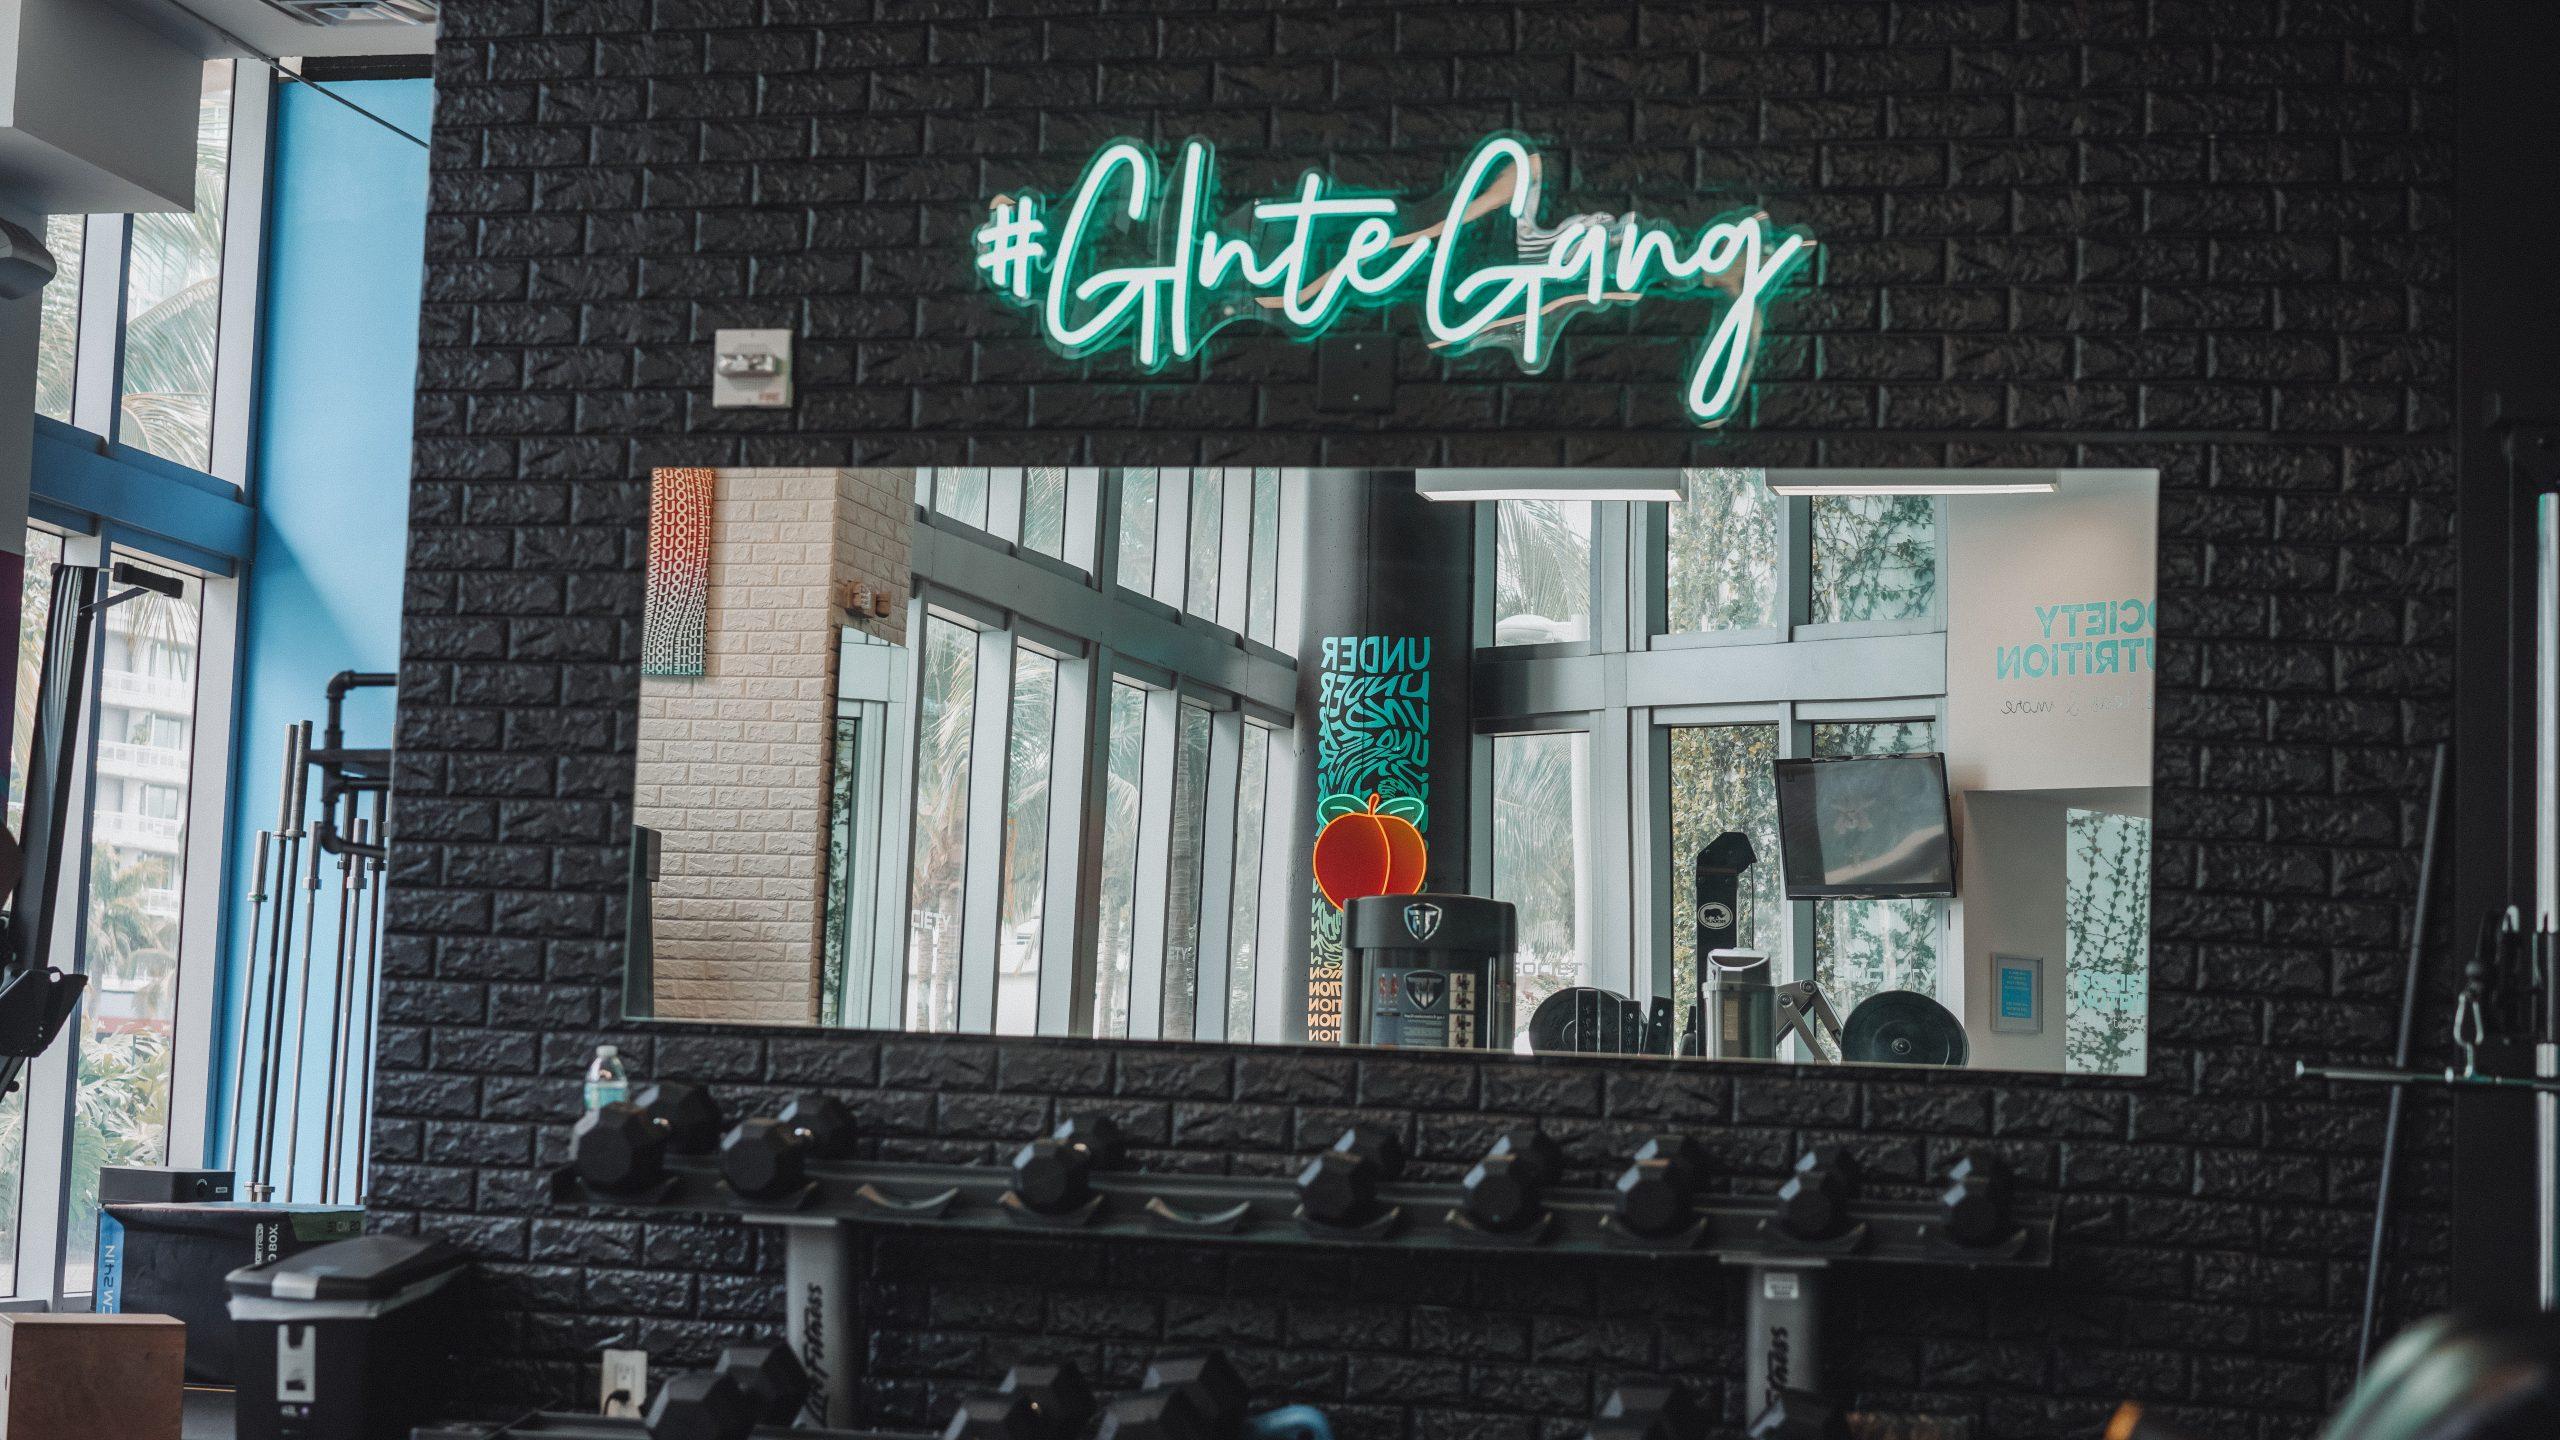 Glutehouse|Glutehouse|Glutehouse|Glutehouse|Glutehouse|Glutehouse|Glutehouse